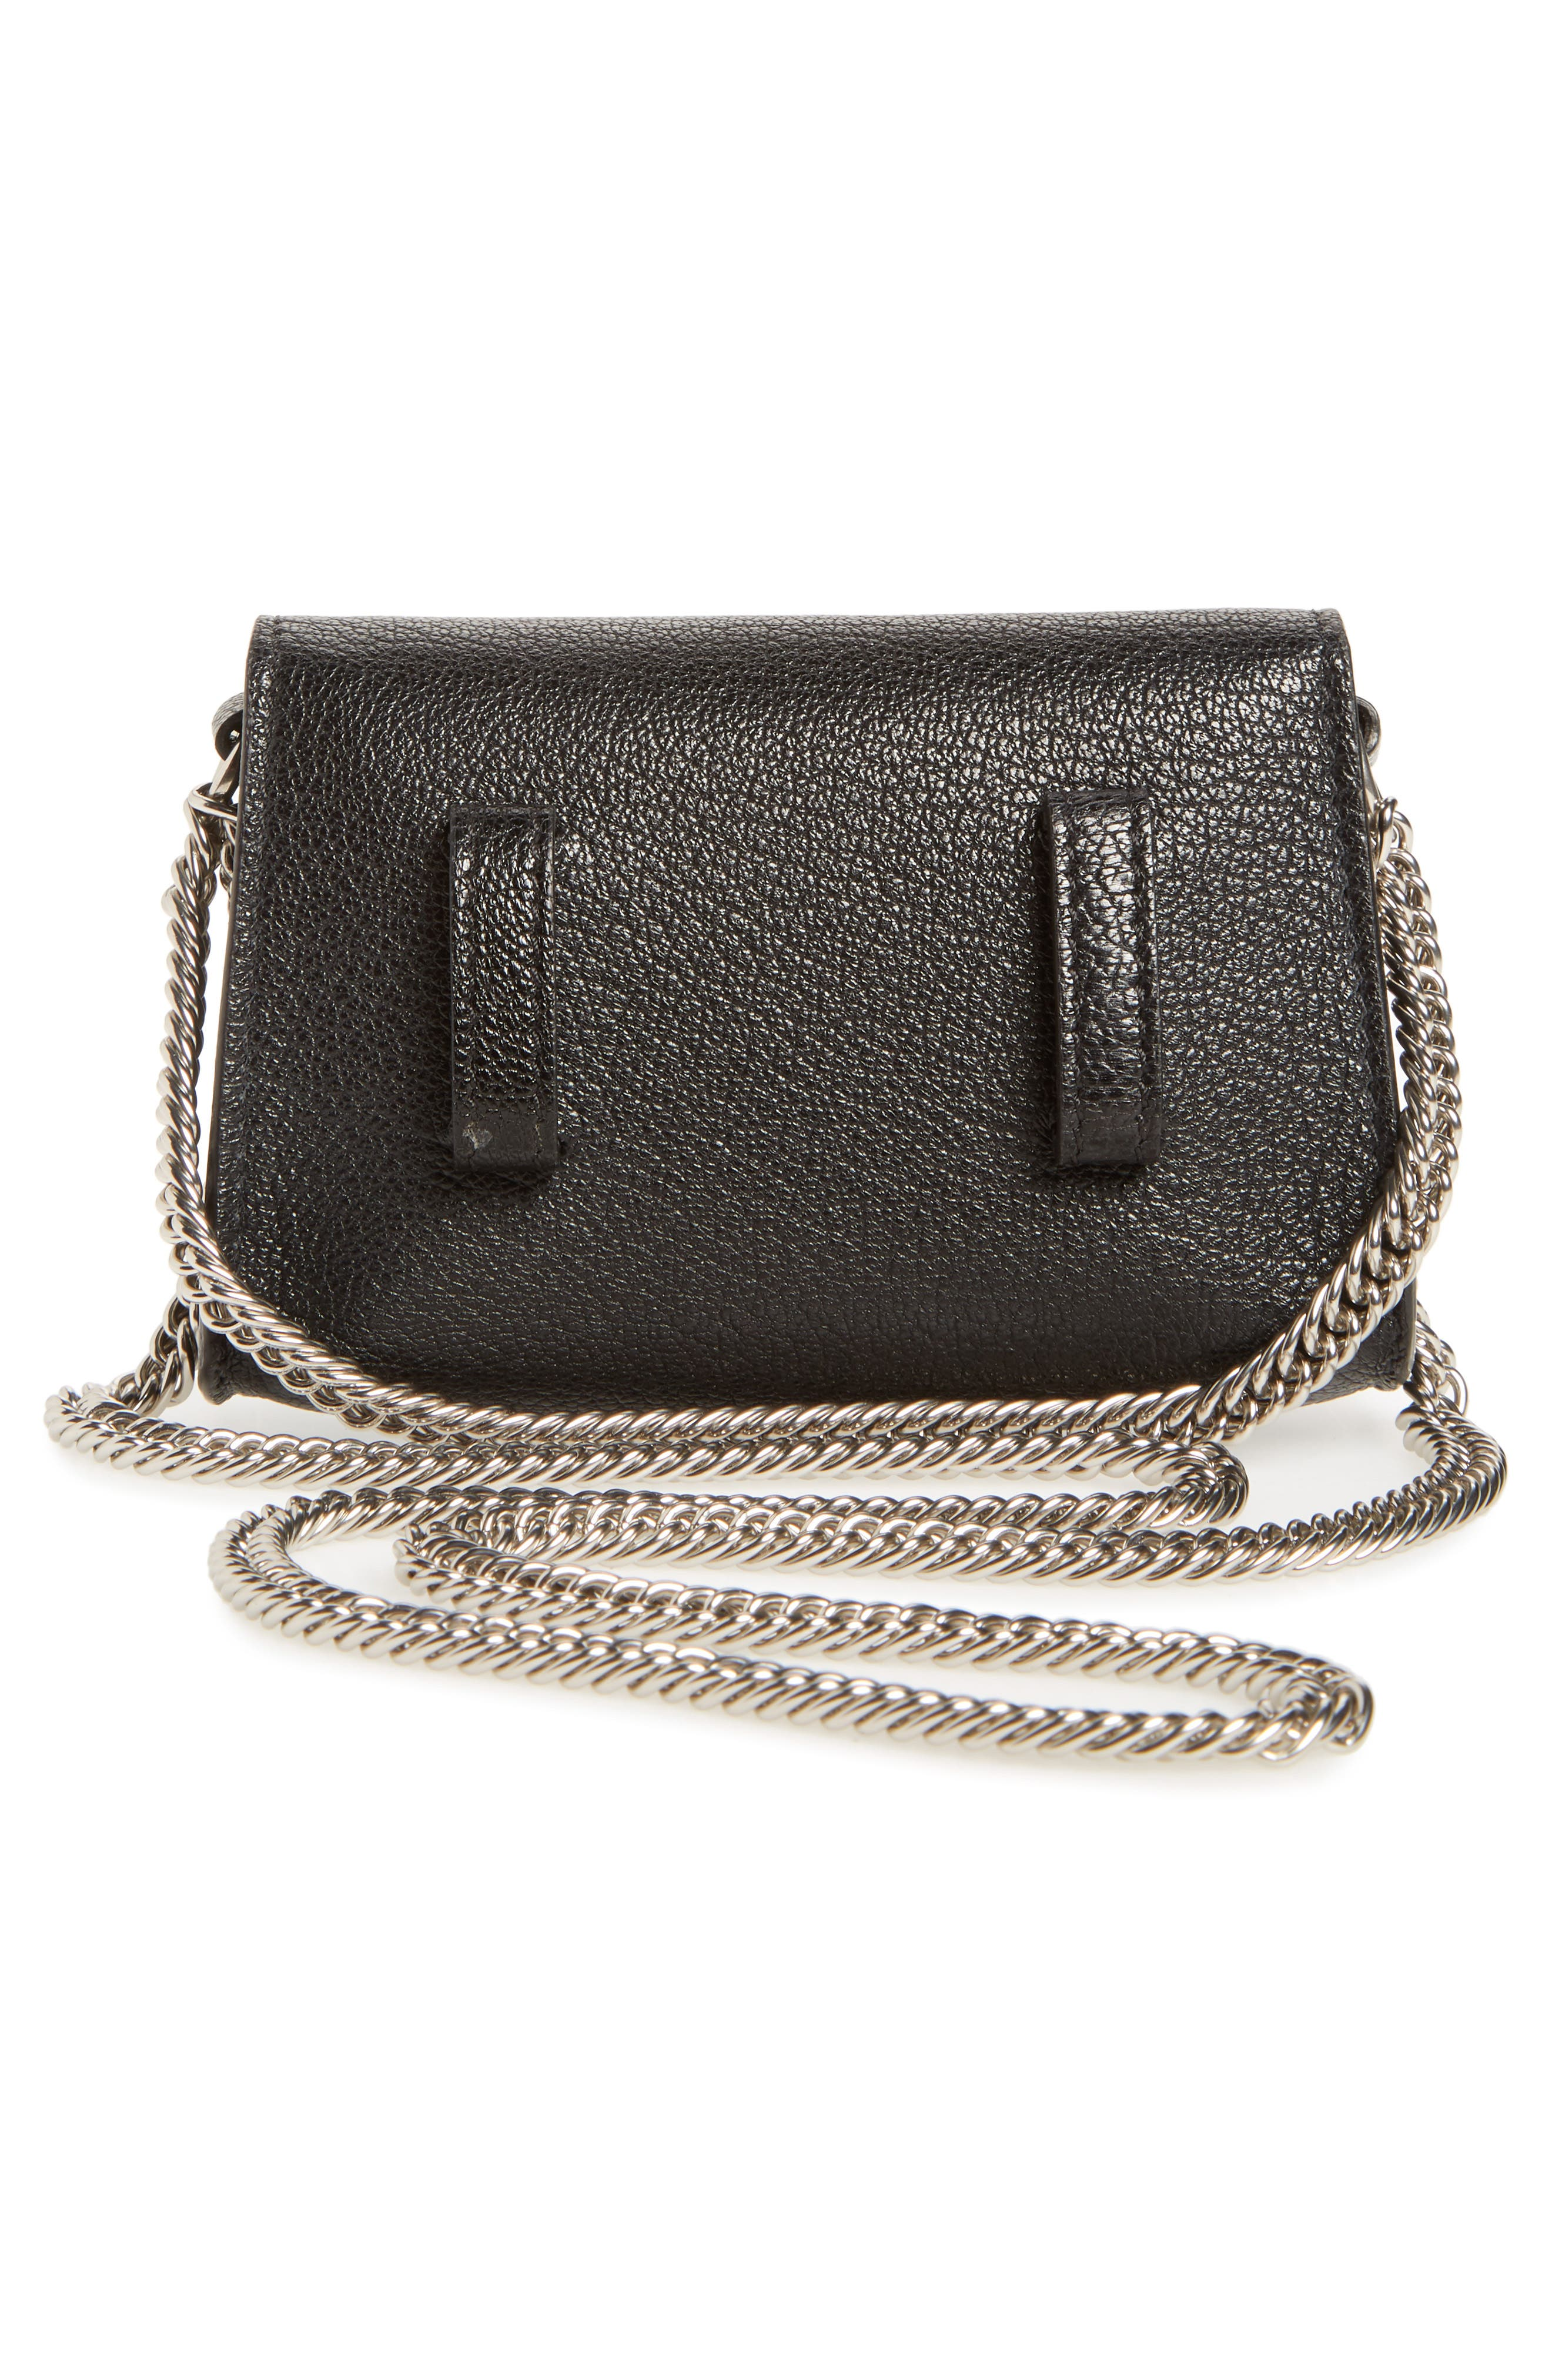 Nano GV3 Leather Crossbody Bag,                             Alternate thumbnail 3, color,                             Black